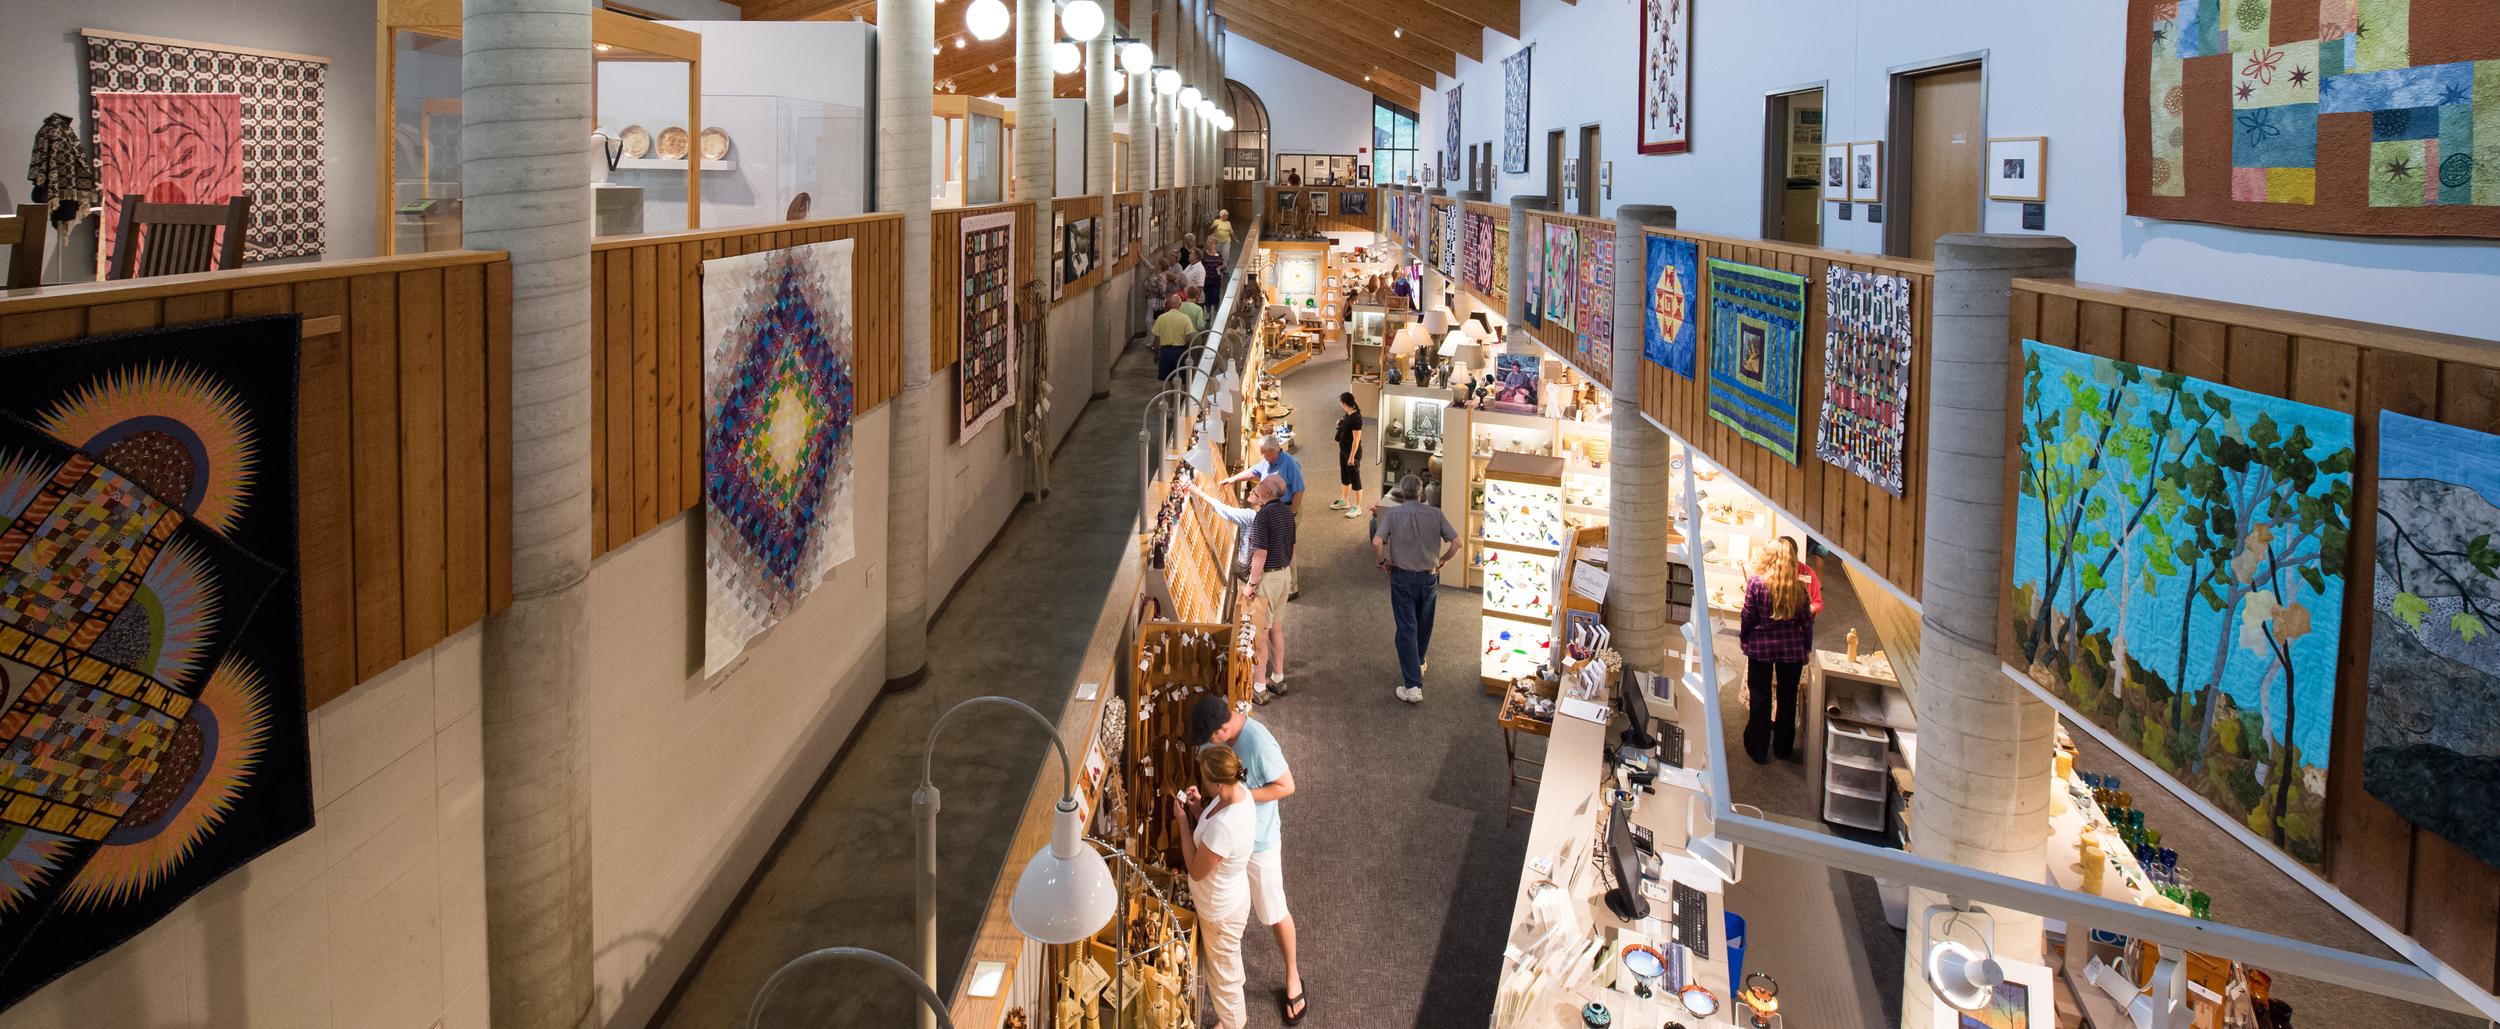 Southern Highlands Folk Art Center Blue Ridge Parkway near Asheville